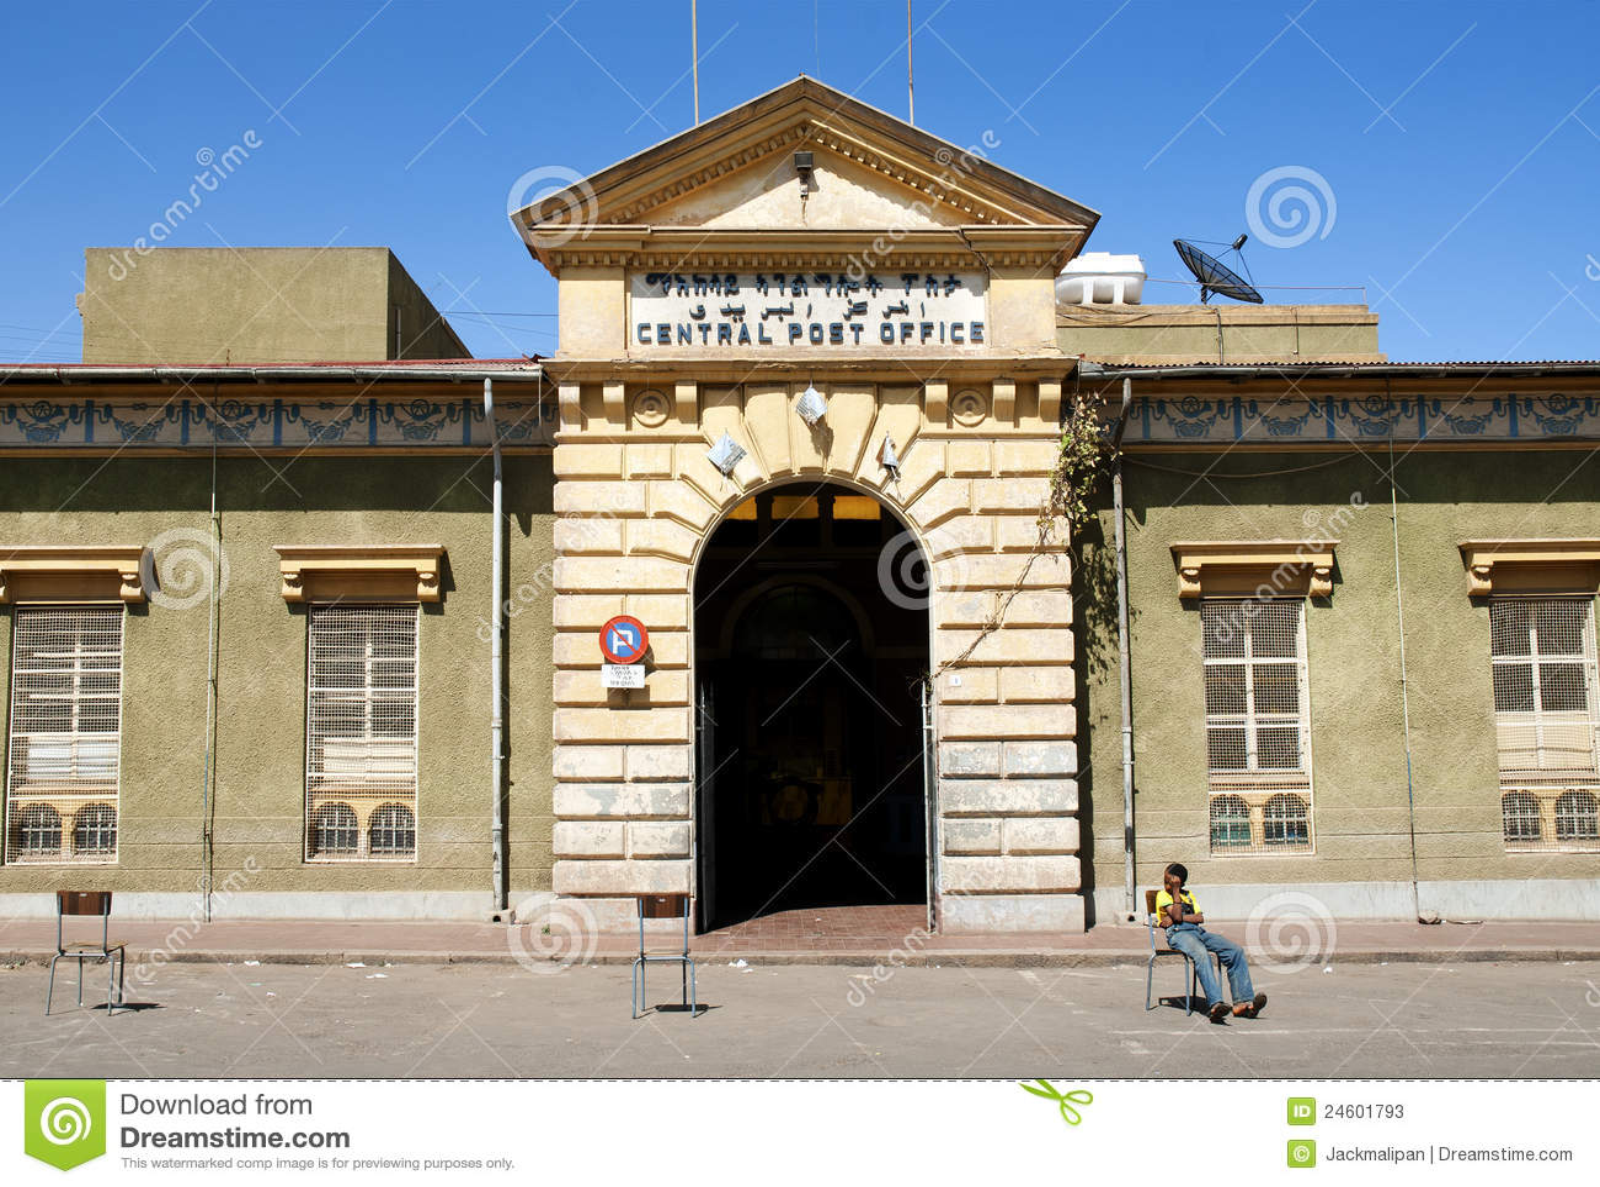 Stock Photos Central Post Office Asmara Eritrea Image24601793 together with Art Nouveau Fireplace Surround likewise Splashing orange 311171 moreover Heart clip art 13210 also 10483995985. on art deco landscape design